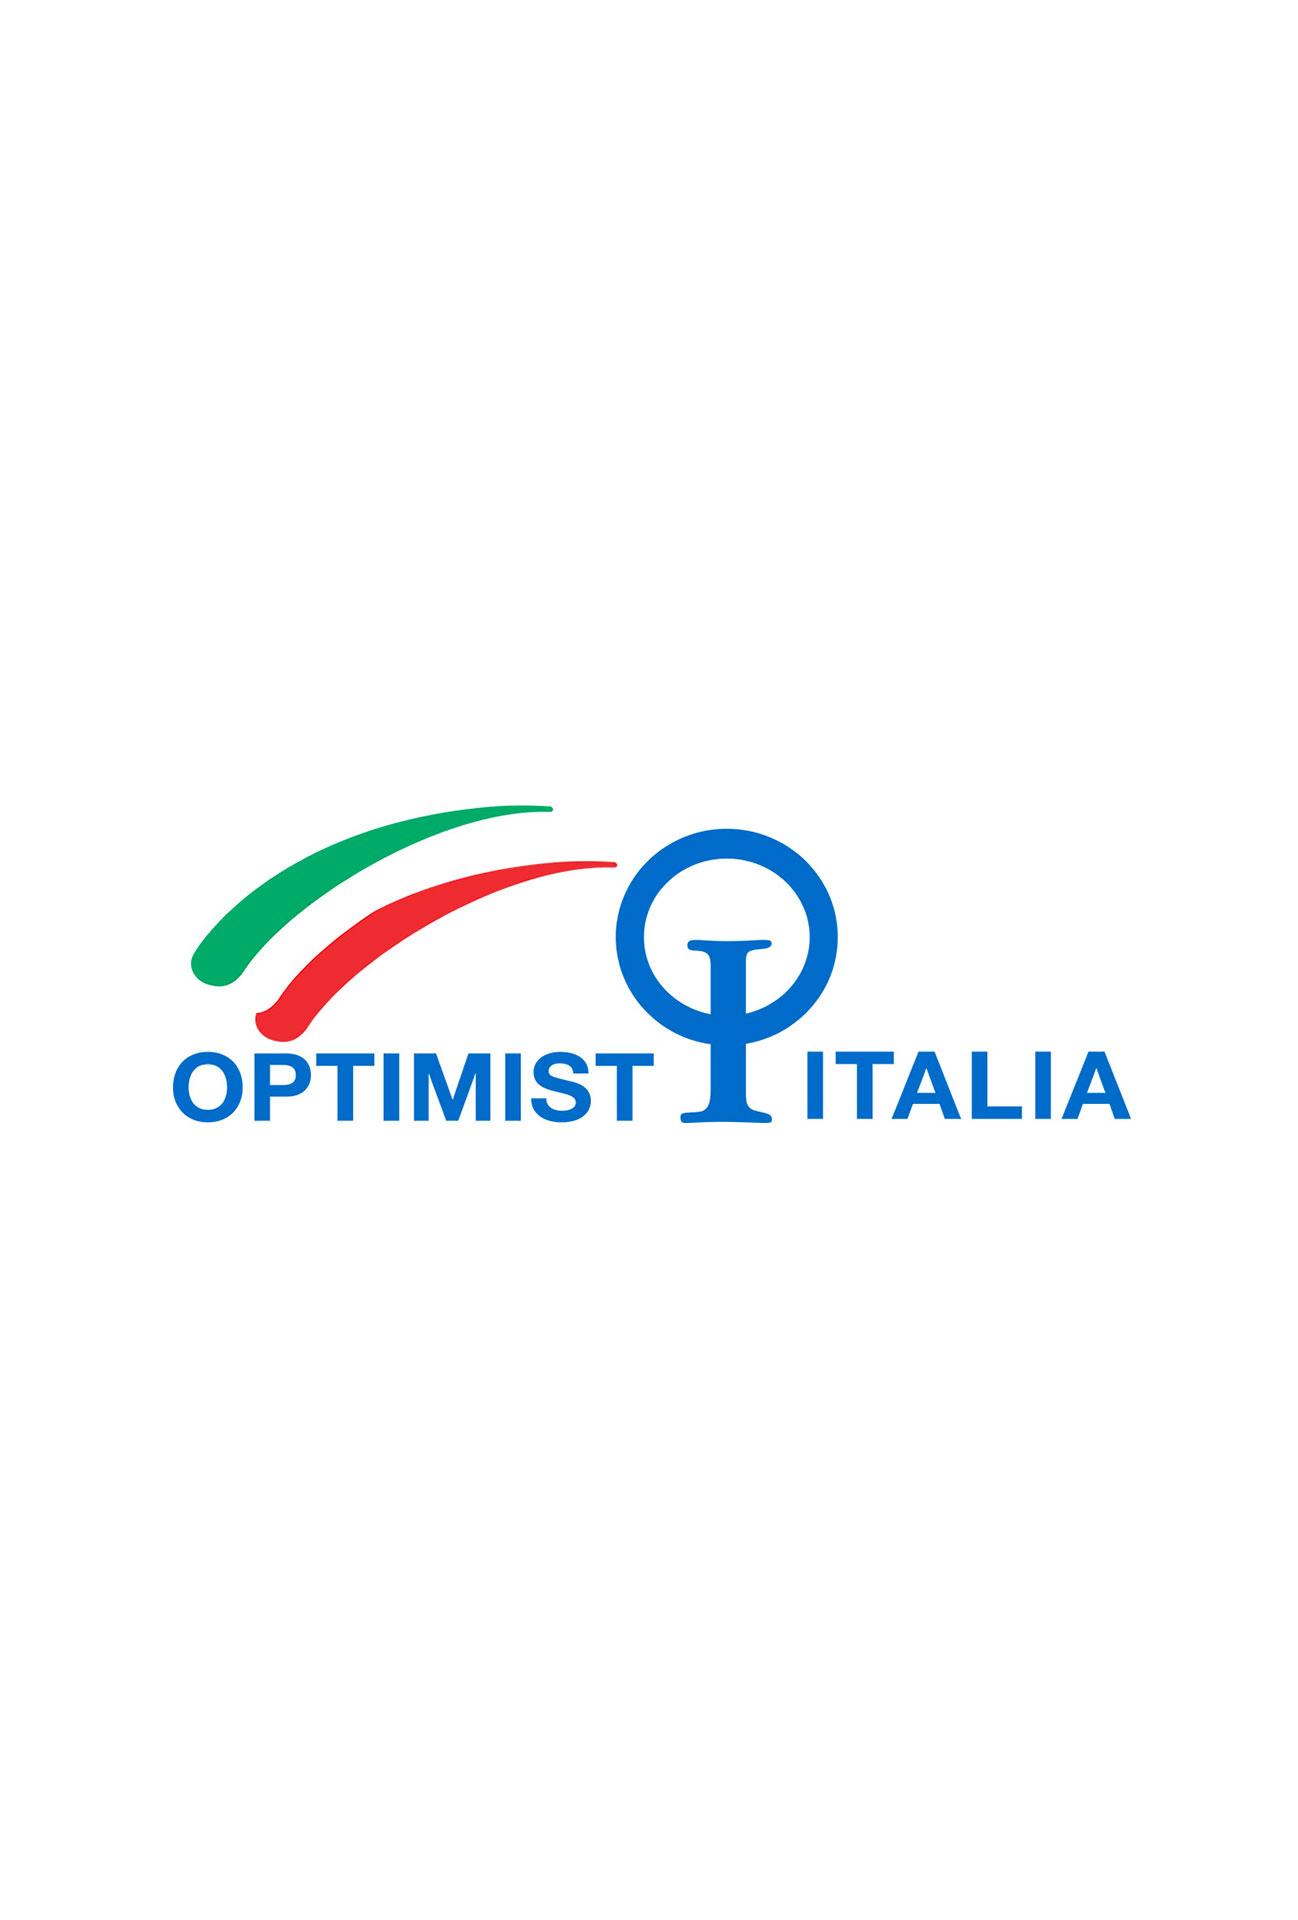 optimistitalia-elengiolai-collaborazioni